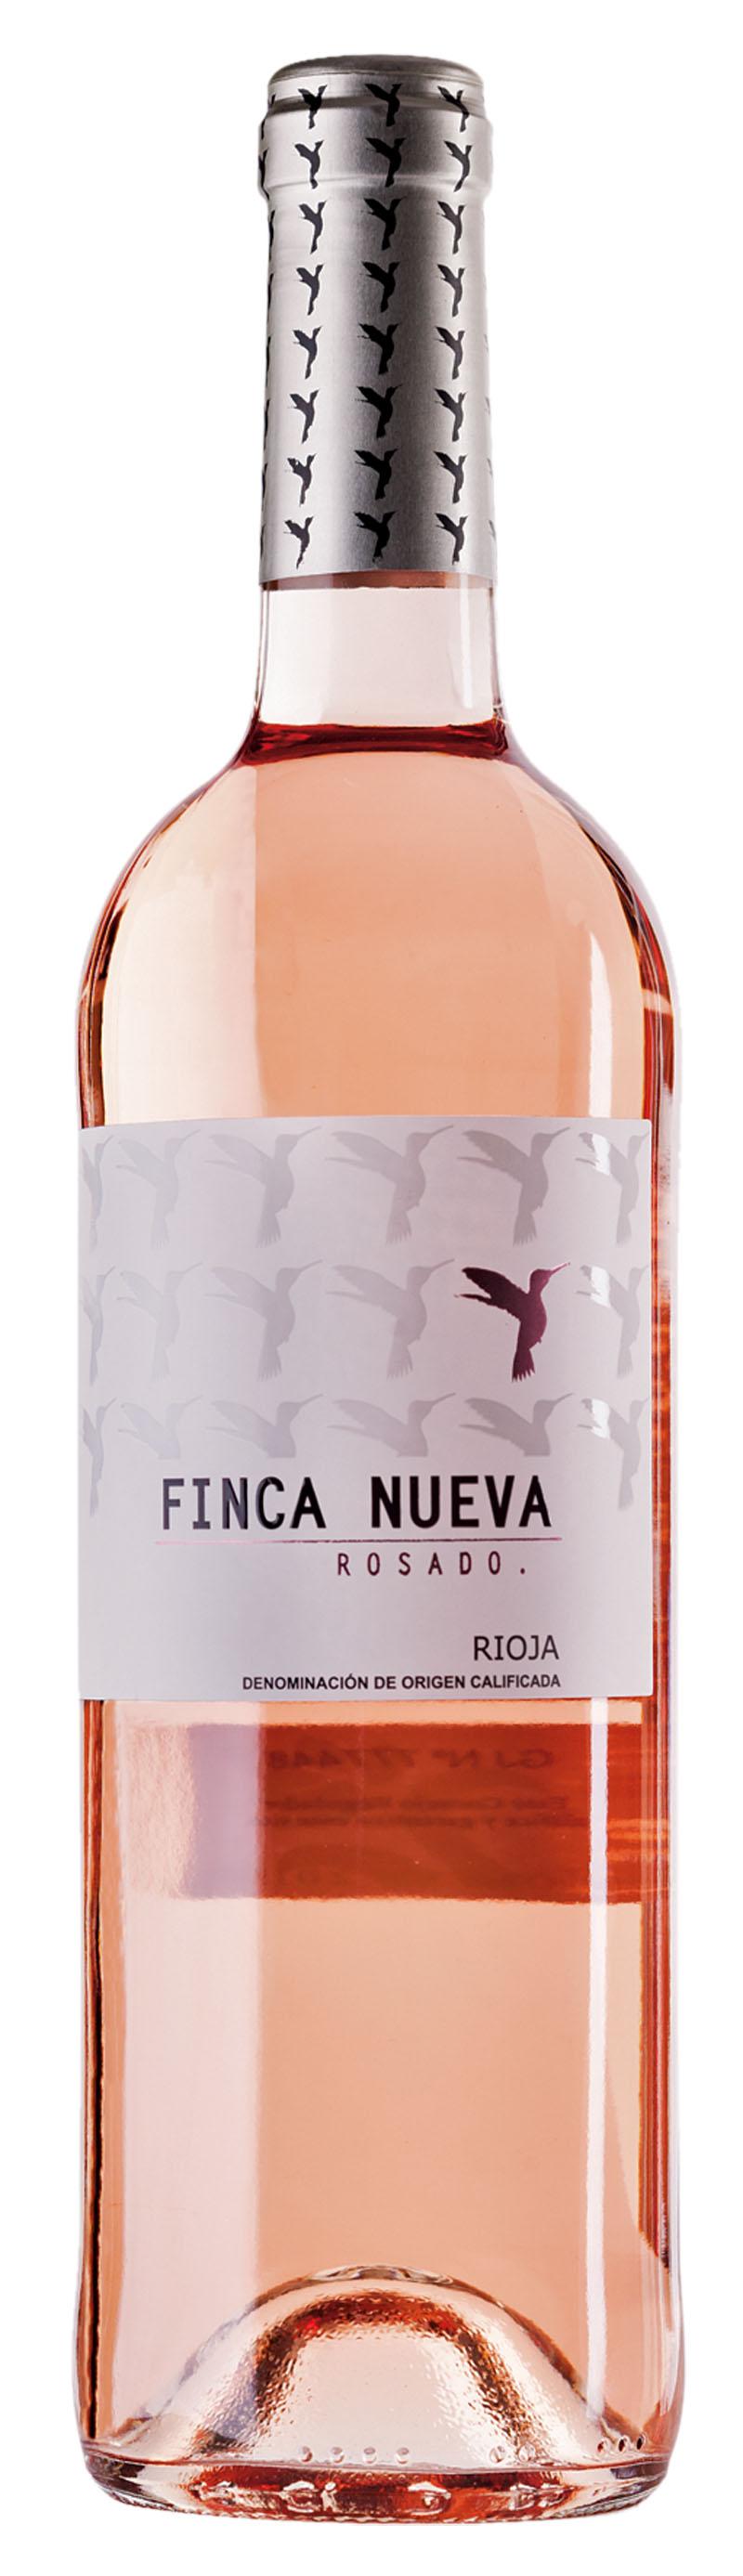 vino finca nueva rose para mousse mano y platano, martin berasategui, receta, xlsemanal